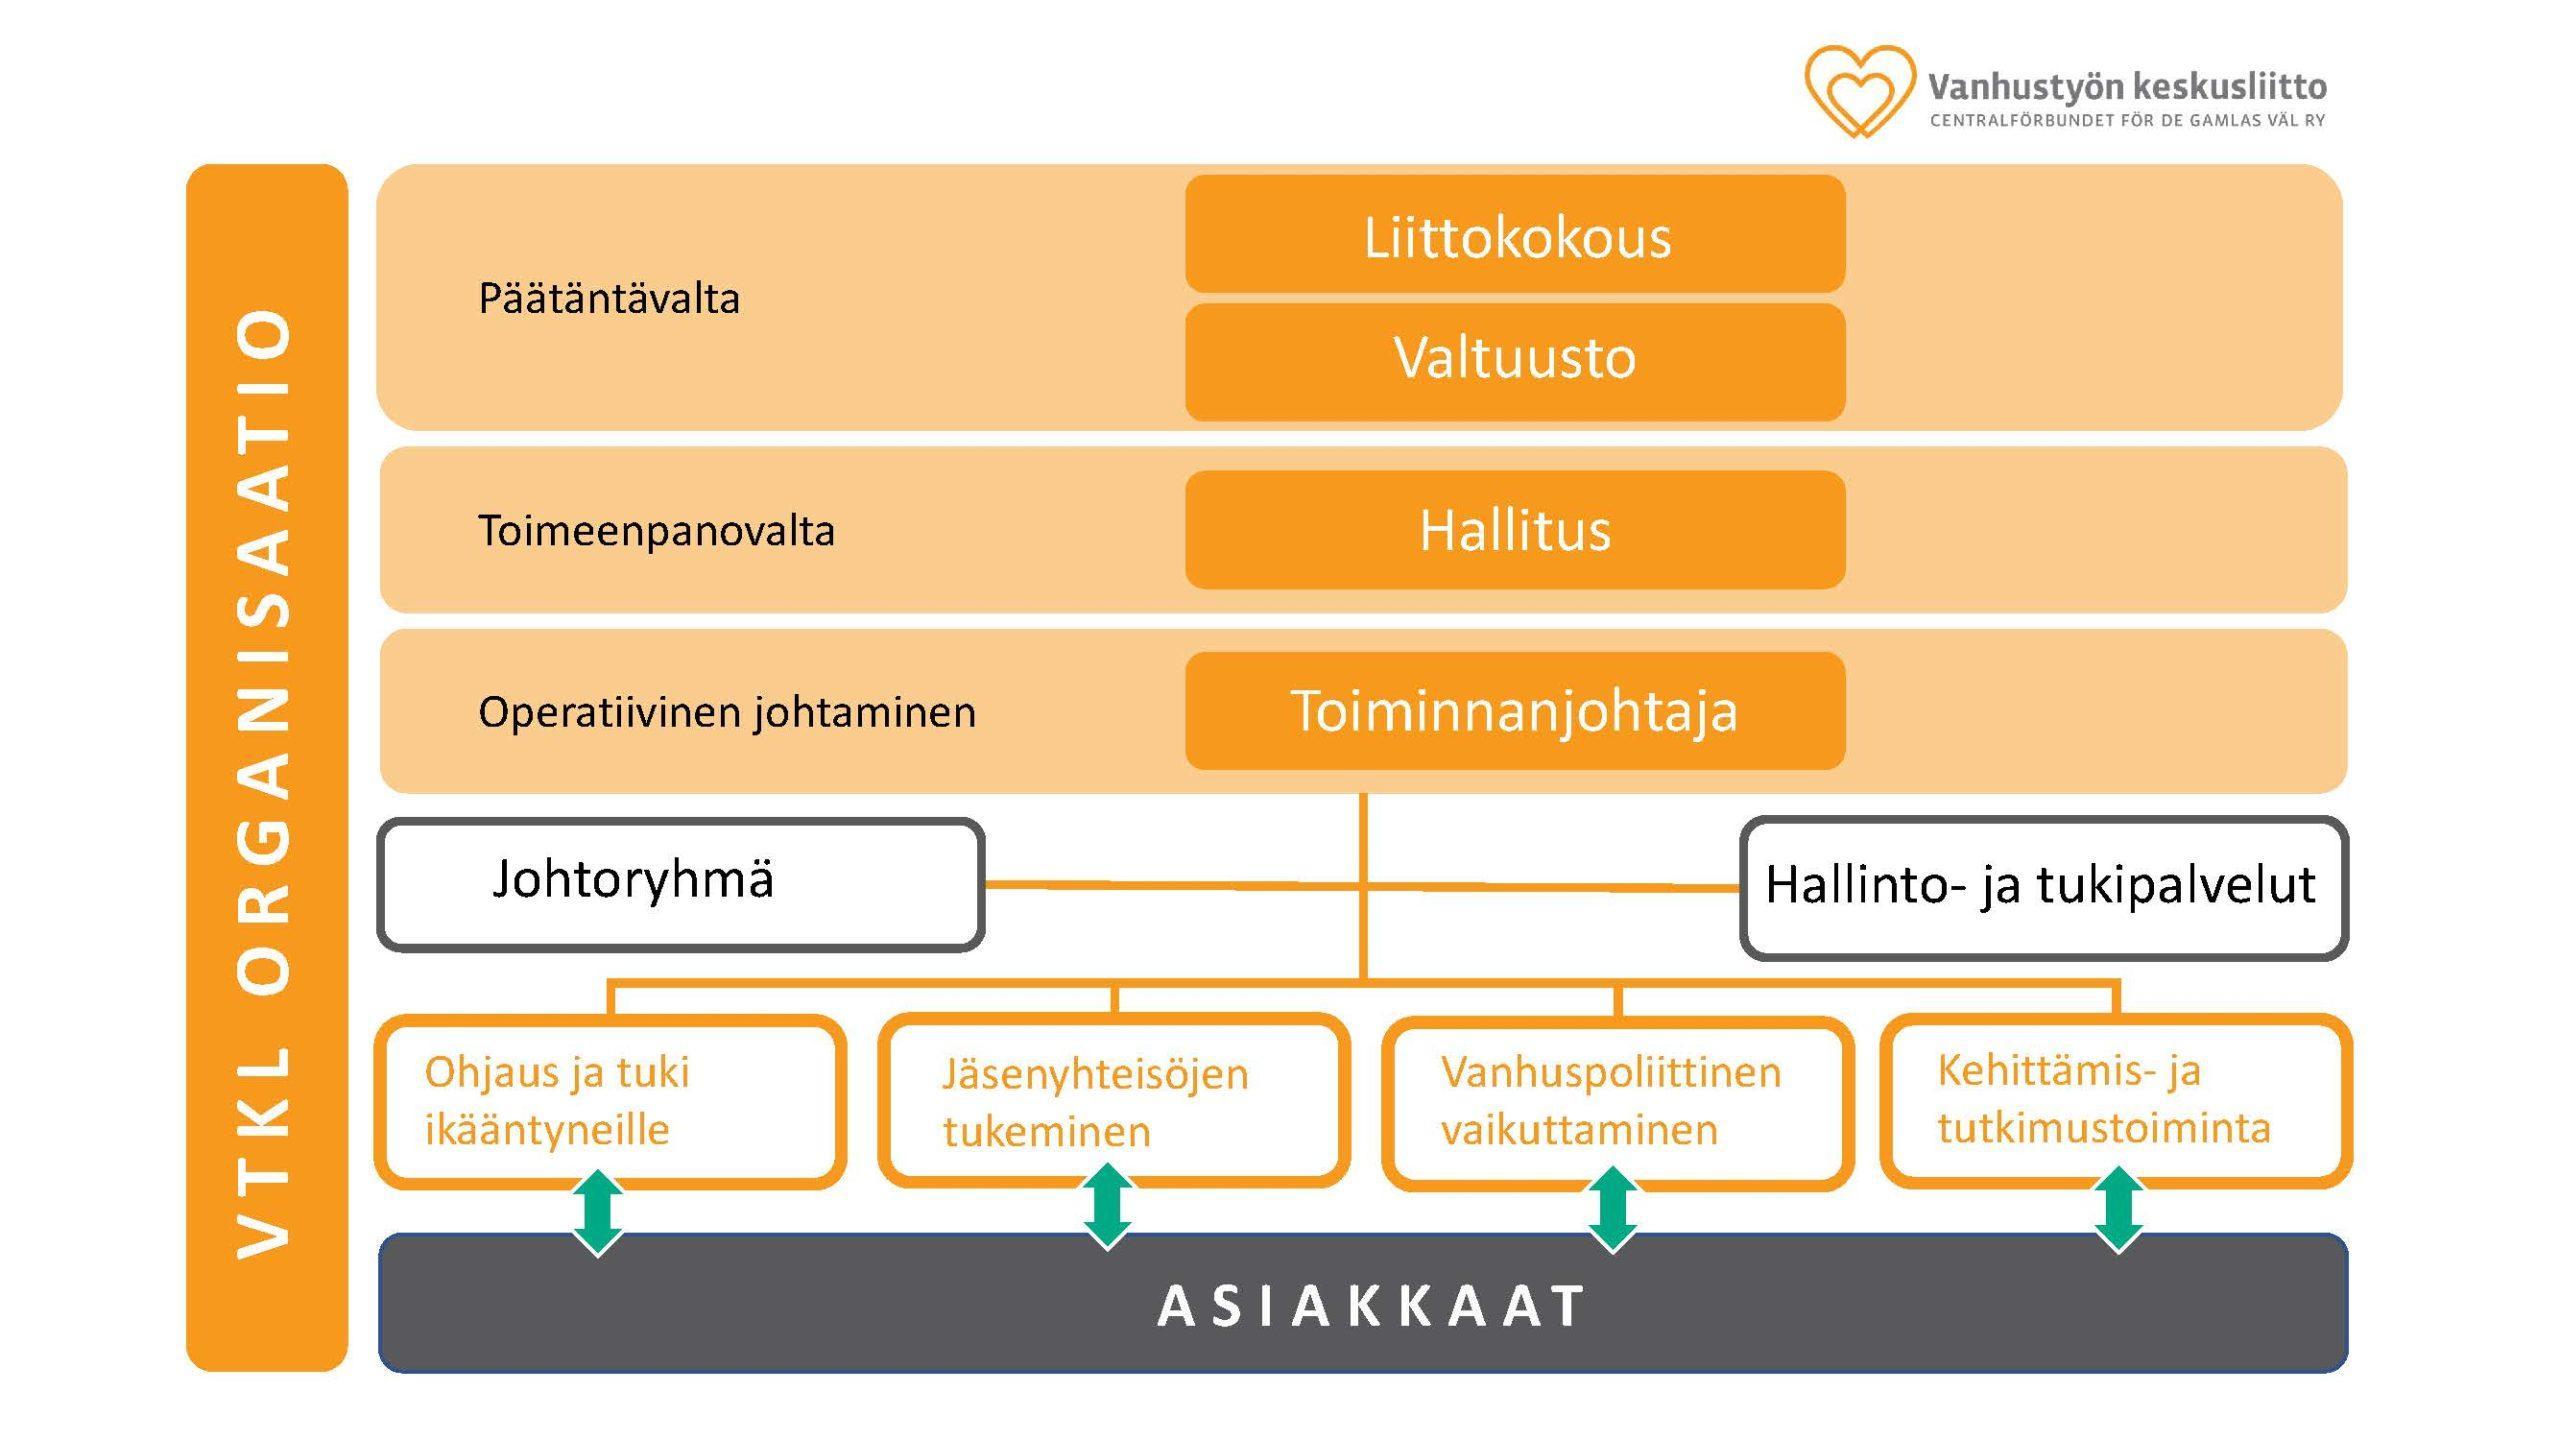 VTKL organisaatiokaavio